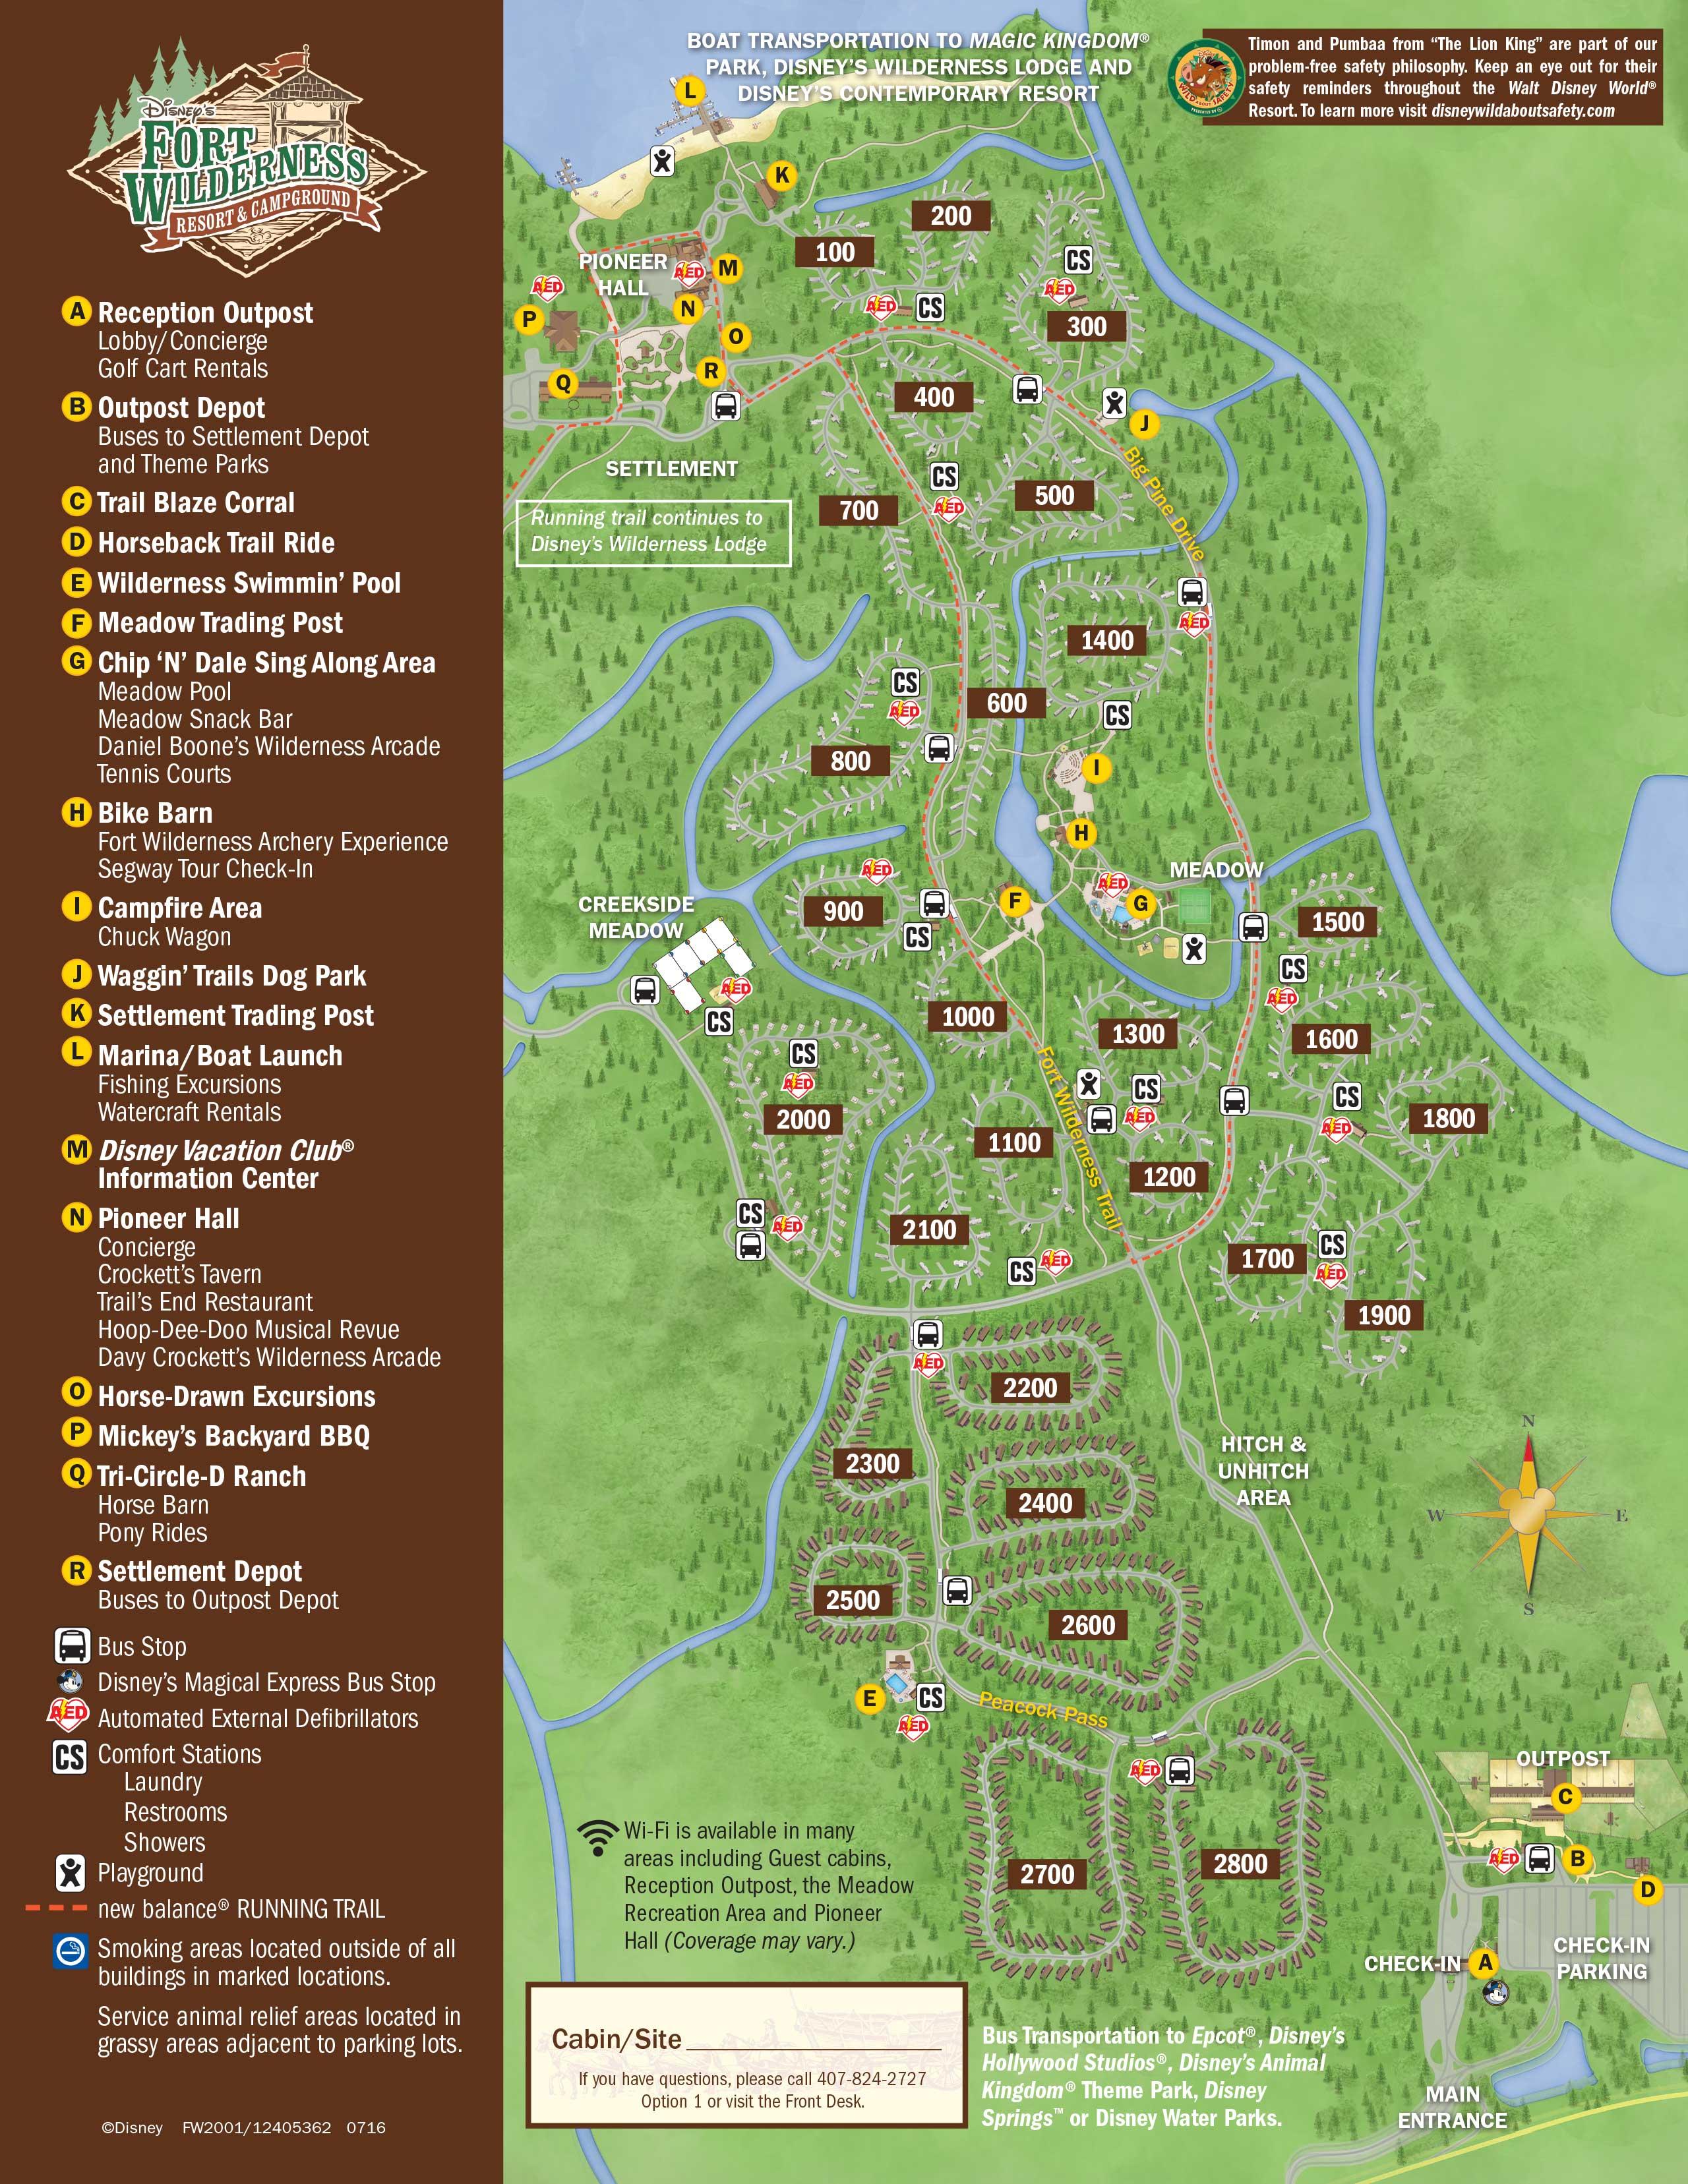 April 2017 Walt Disney World Resort Hotel Maps - Photo 23 of 33